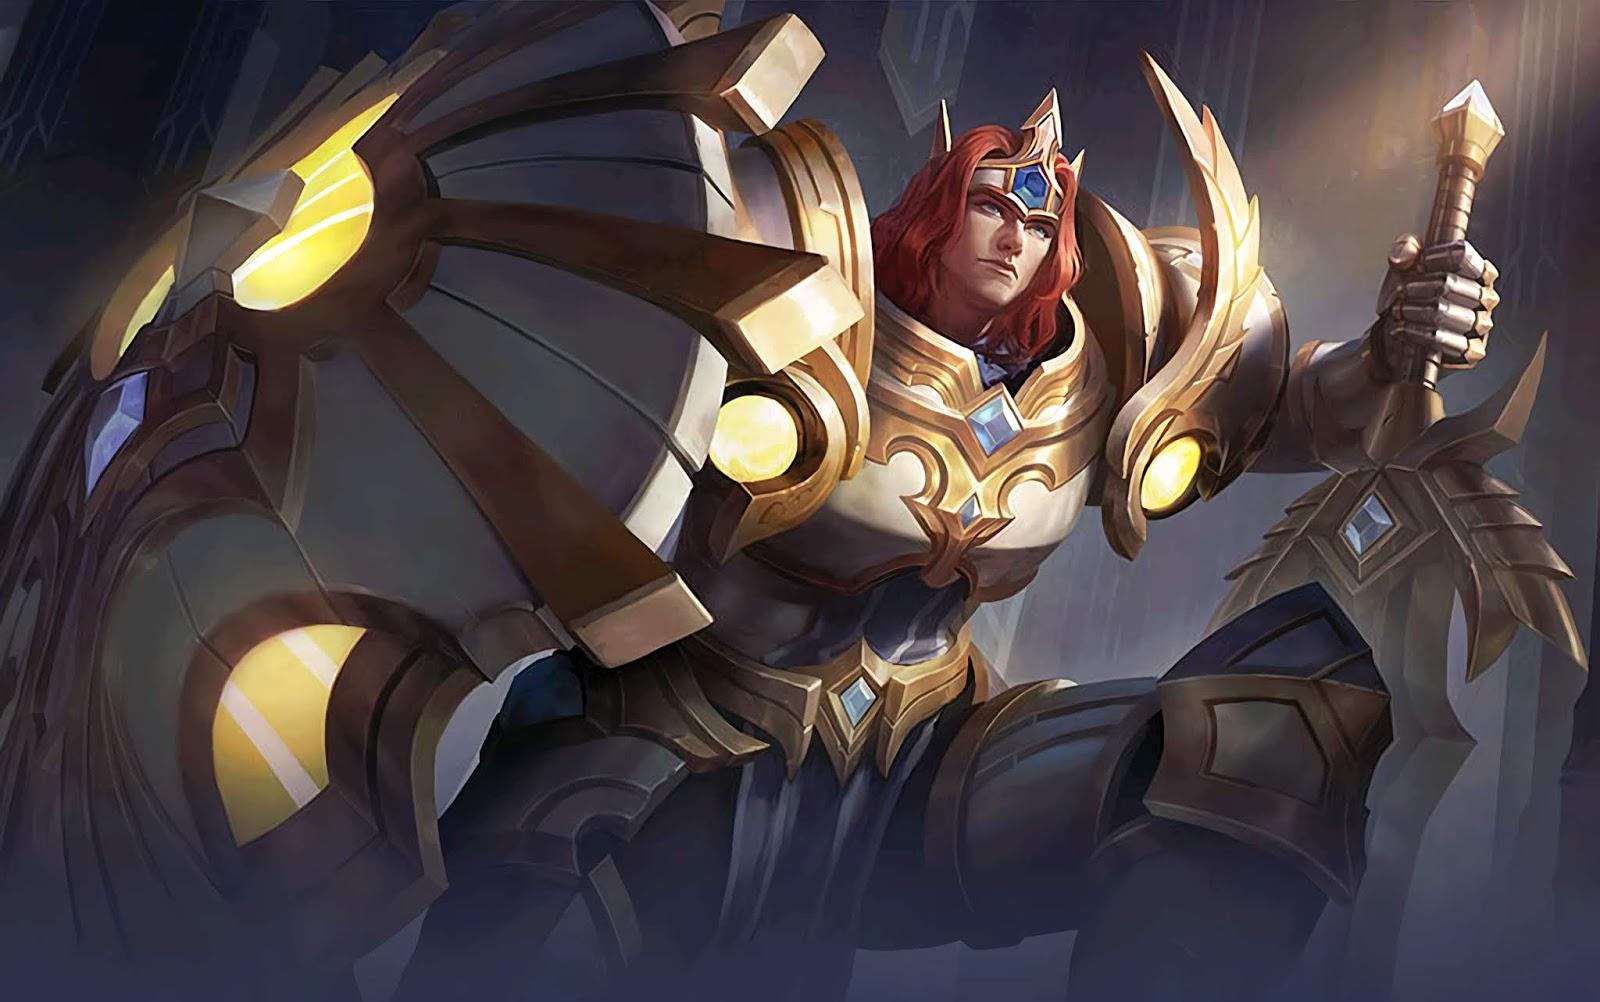 Wallpaper Tigreal Lightborn Defender Skin Mobile Legends HD for PC